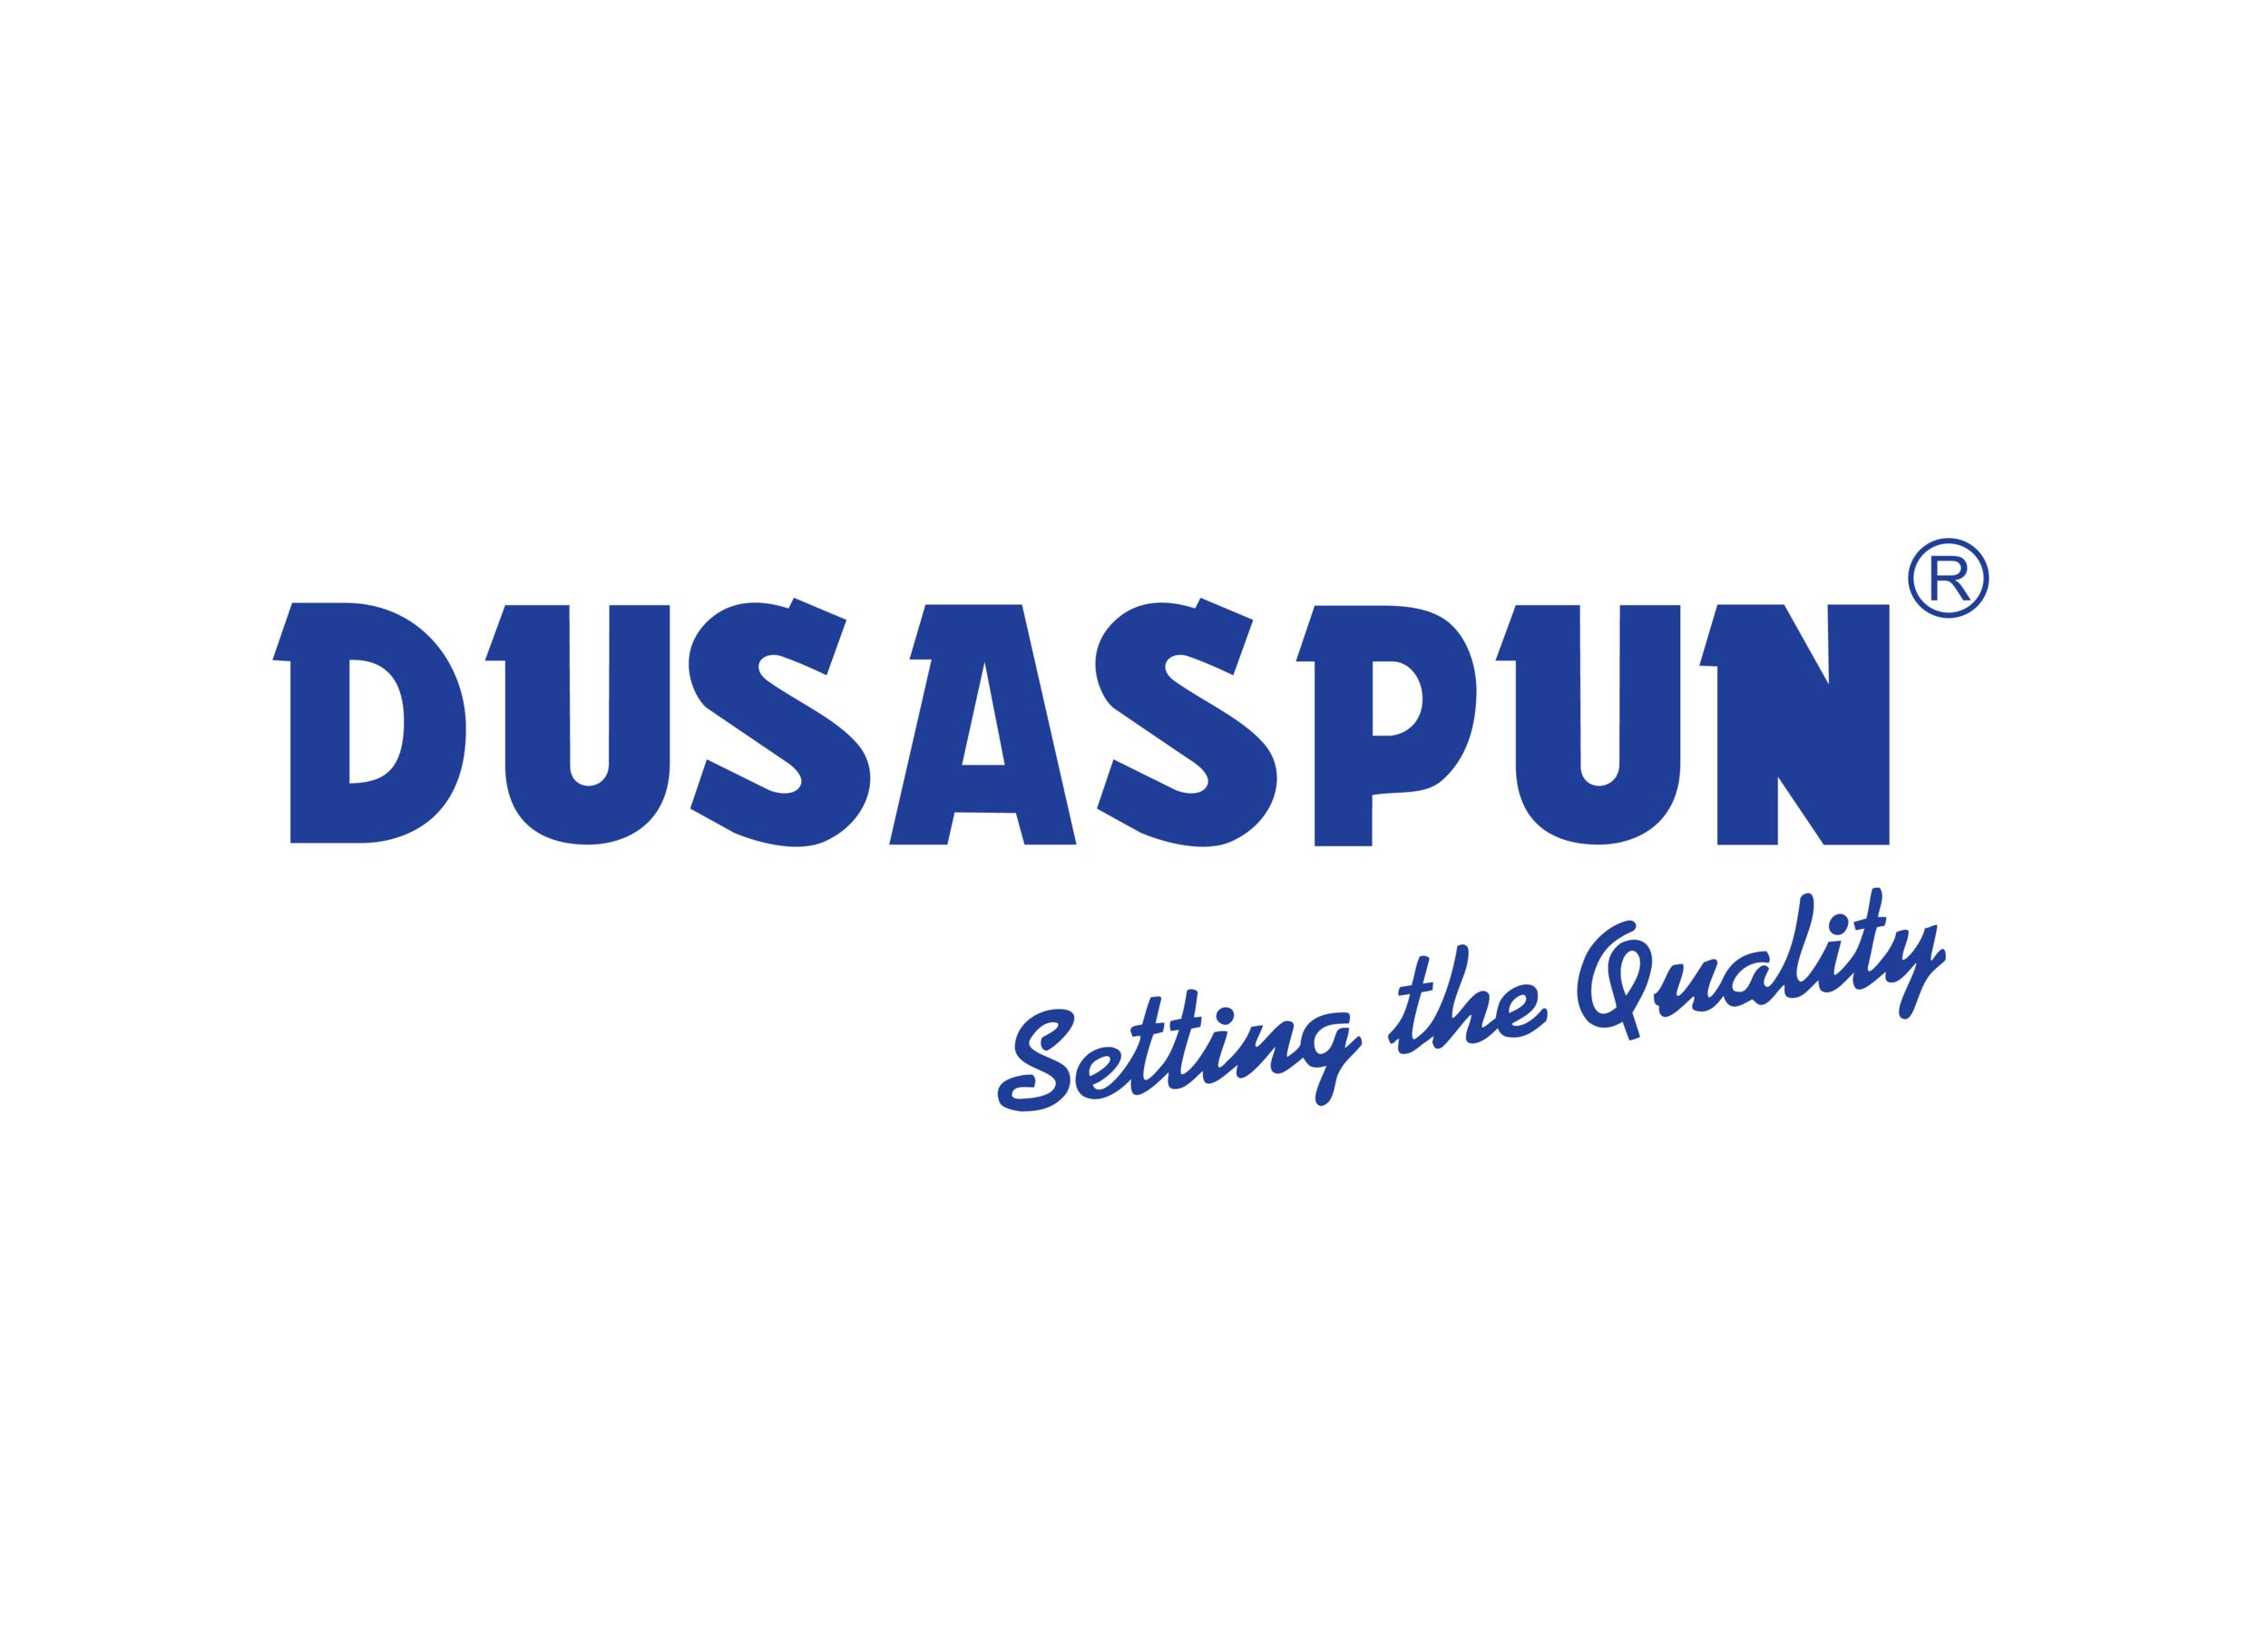 Dusaspun-AQ 2.png